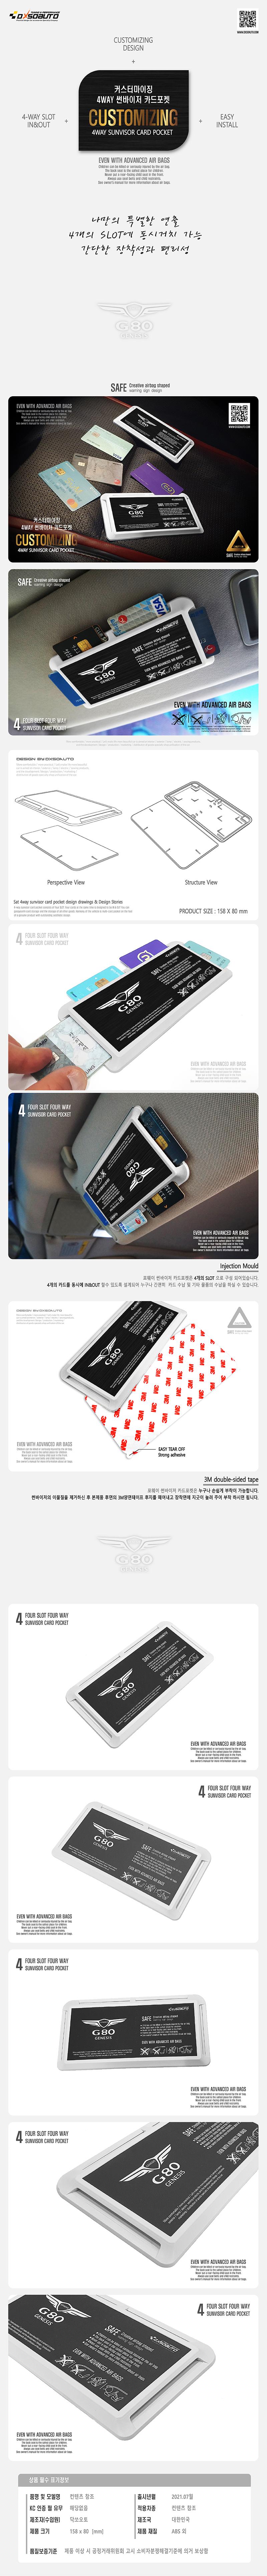 [DXSOAUTO] 커스터마이징 4WAY 썬바이저 카드포켓 (1EA / 1SET) 제네시스 G80 화이트